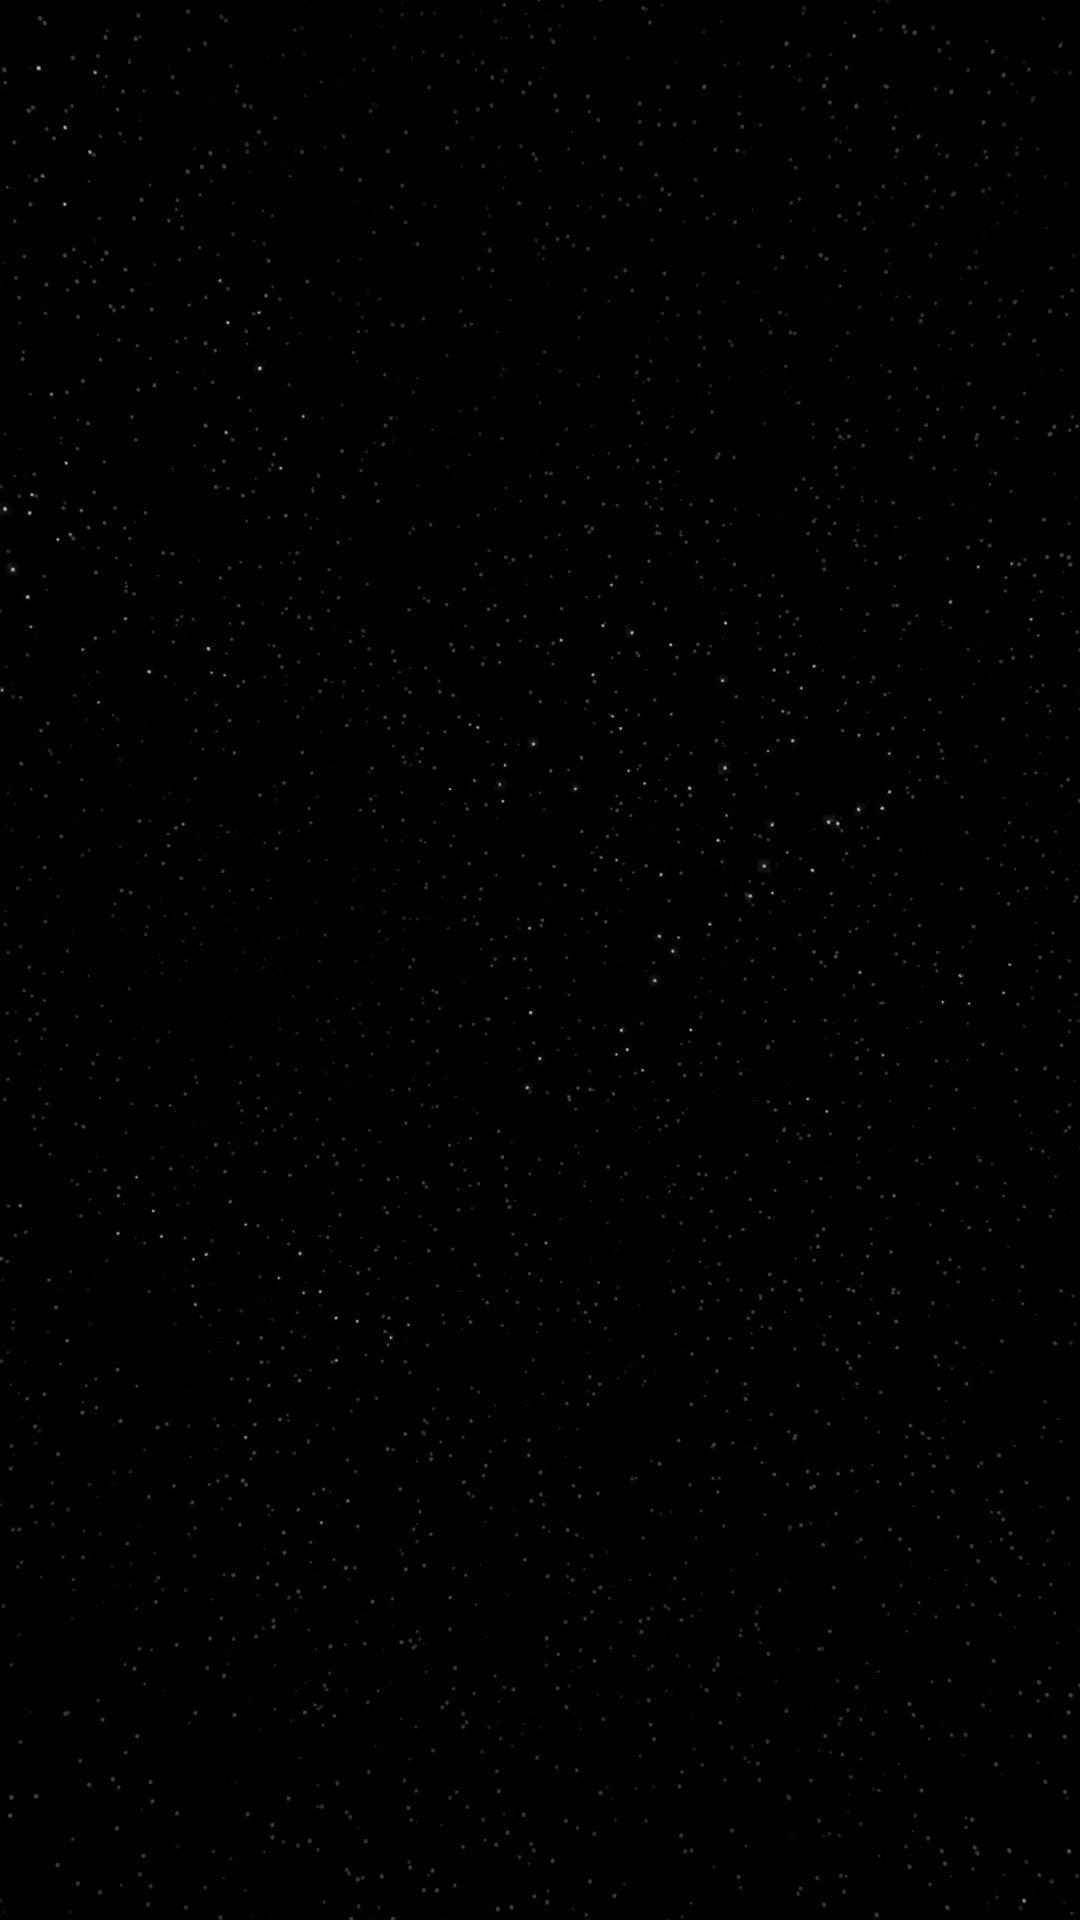 Pin By Agus Cb On Dp Wa Dark Wallpaper Iphone Black Wallpaper Black Aesthetic Wallpaper